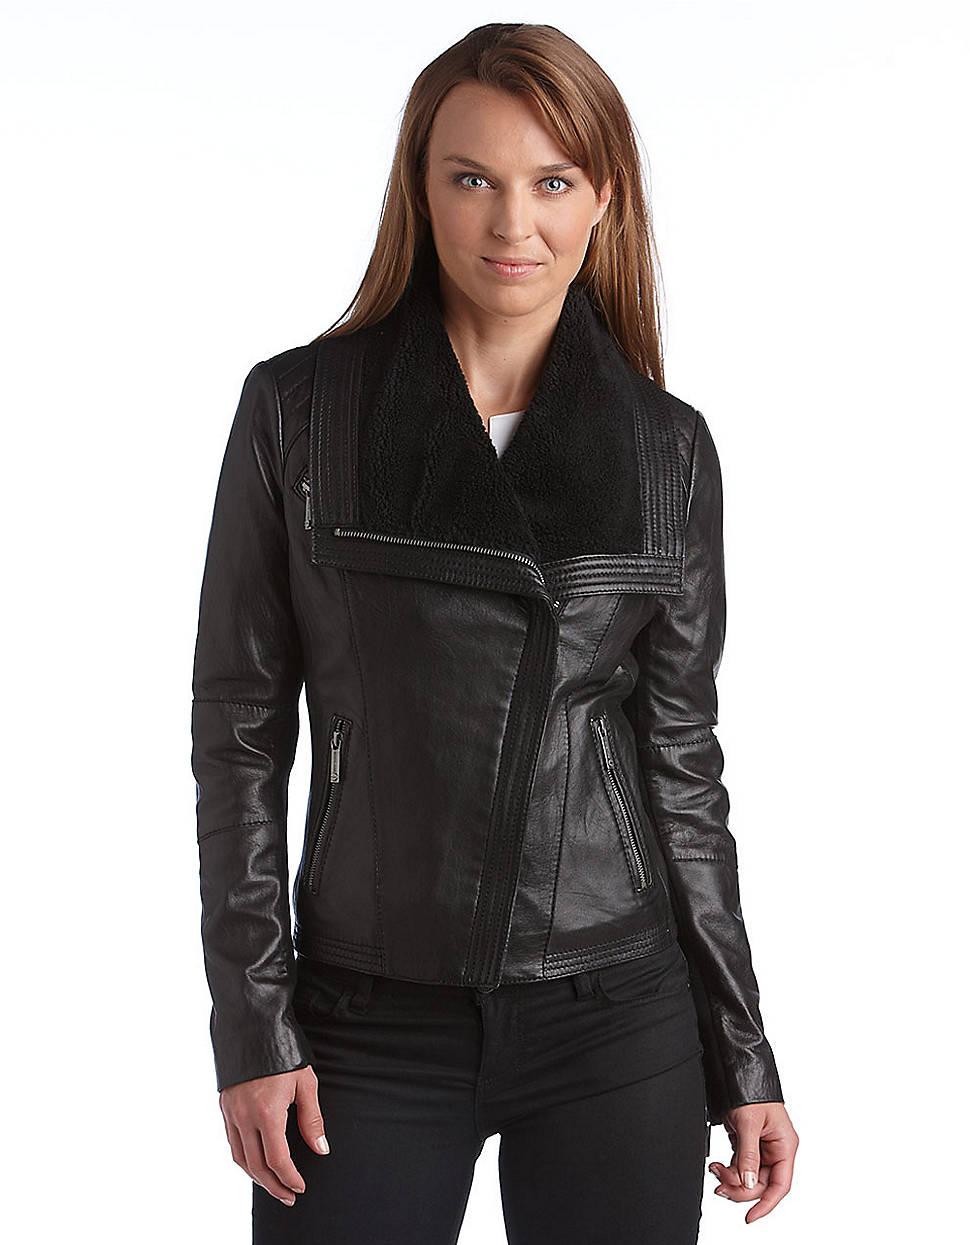 michael kors asymmetrical zip sherpa leather jacket in. Black Bedroom Furniture Sets. Home Design Ideas